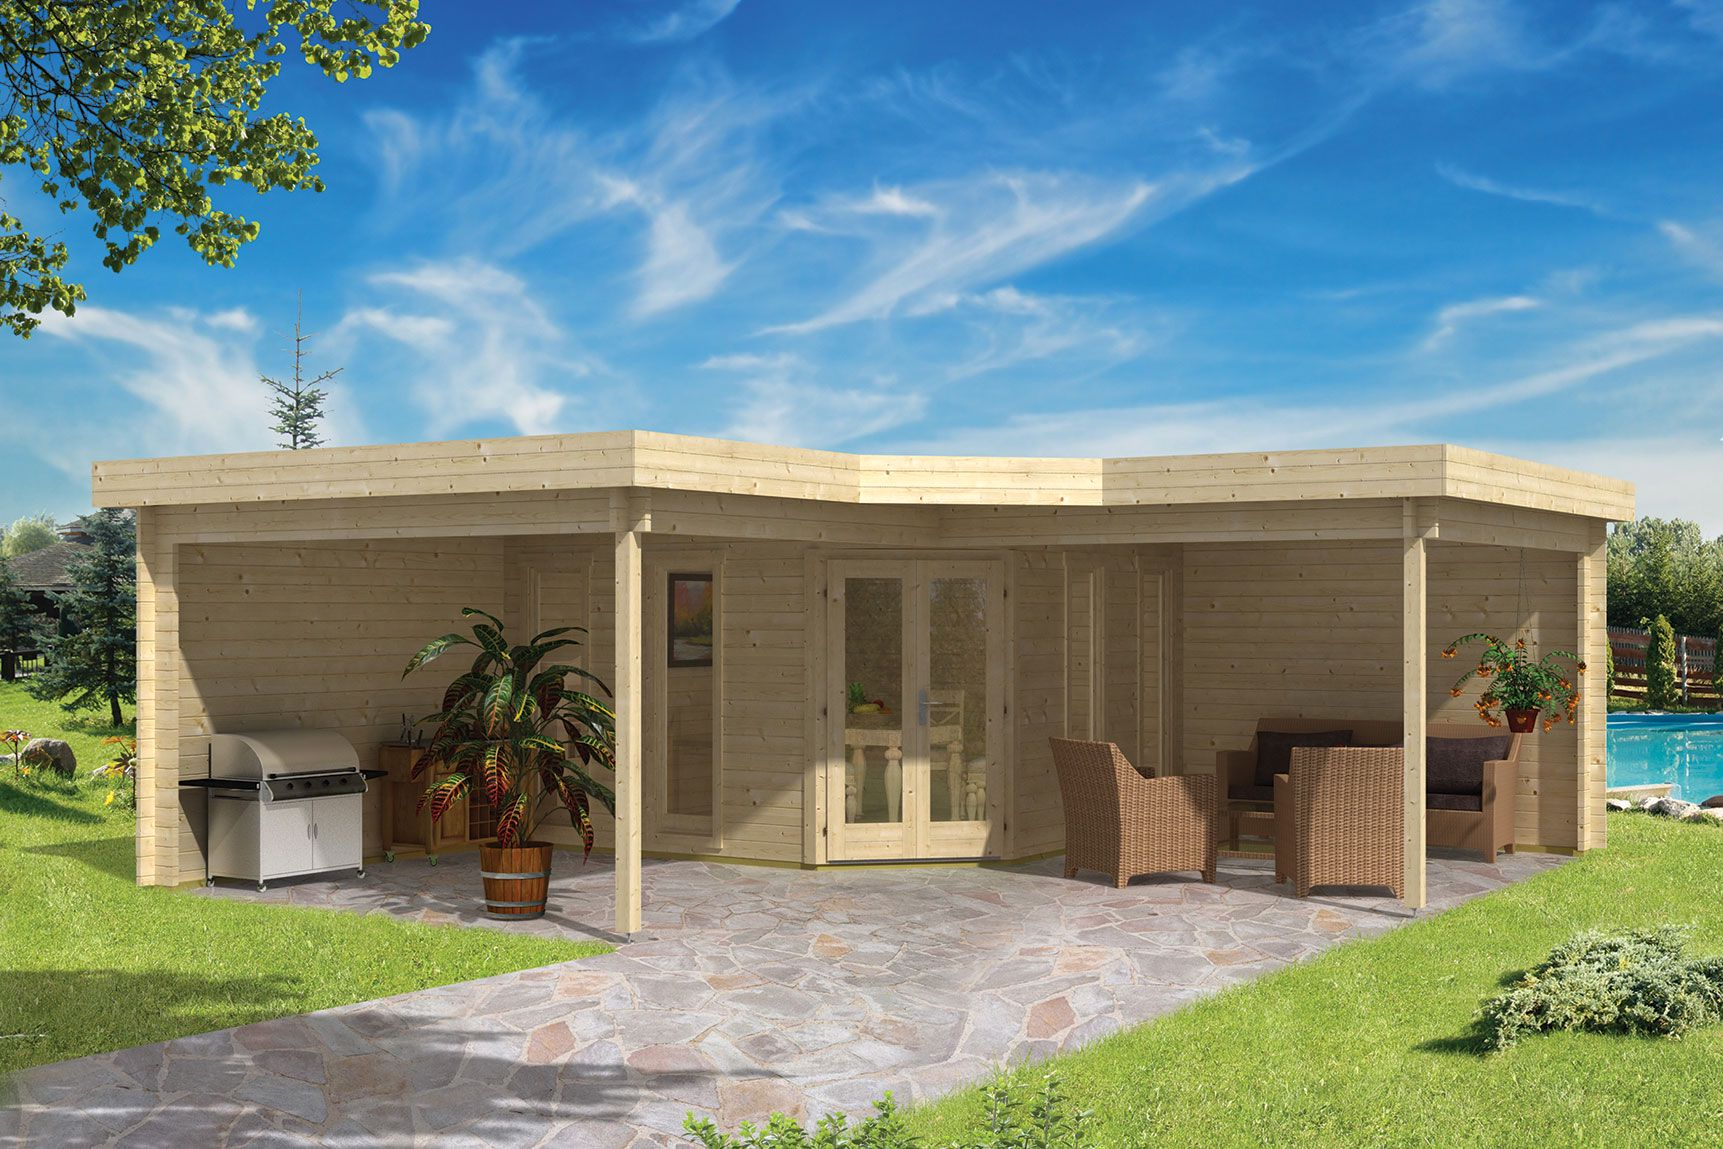 houten blokhut jutka 678 x 678 cm met luifels. Black Bedroom Furniture Sets. Home Design Ideas